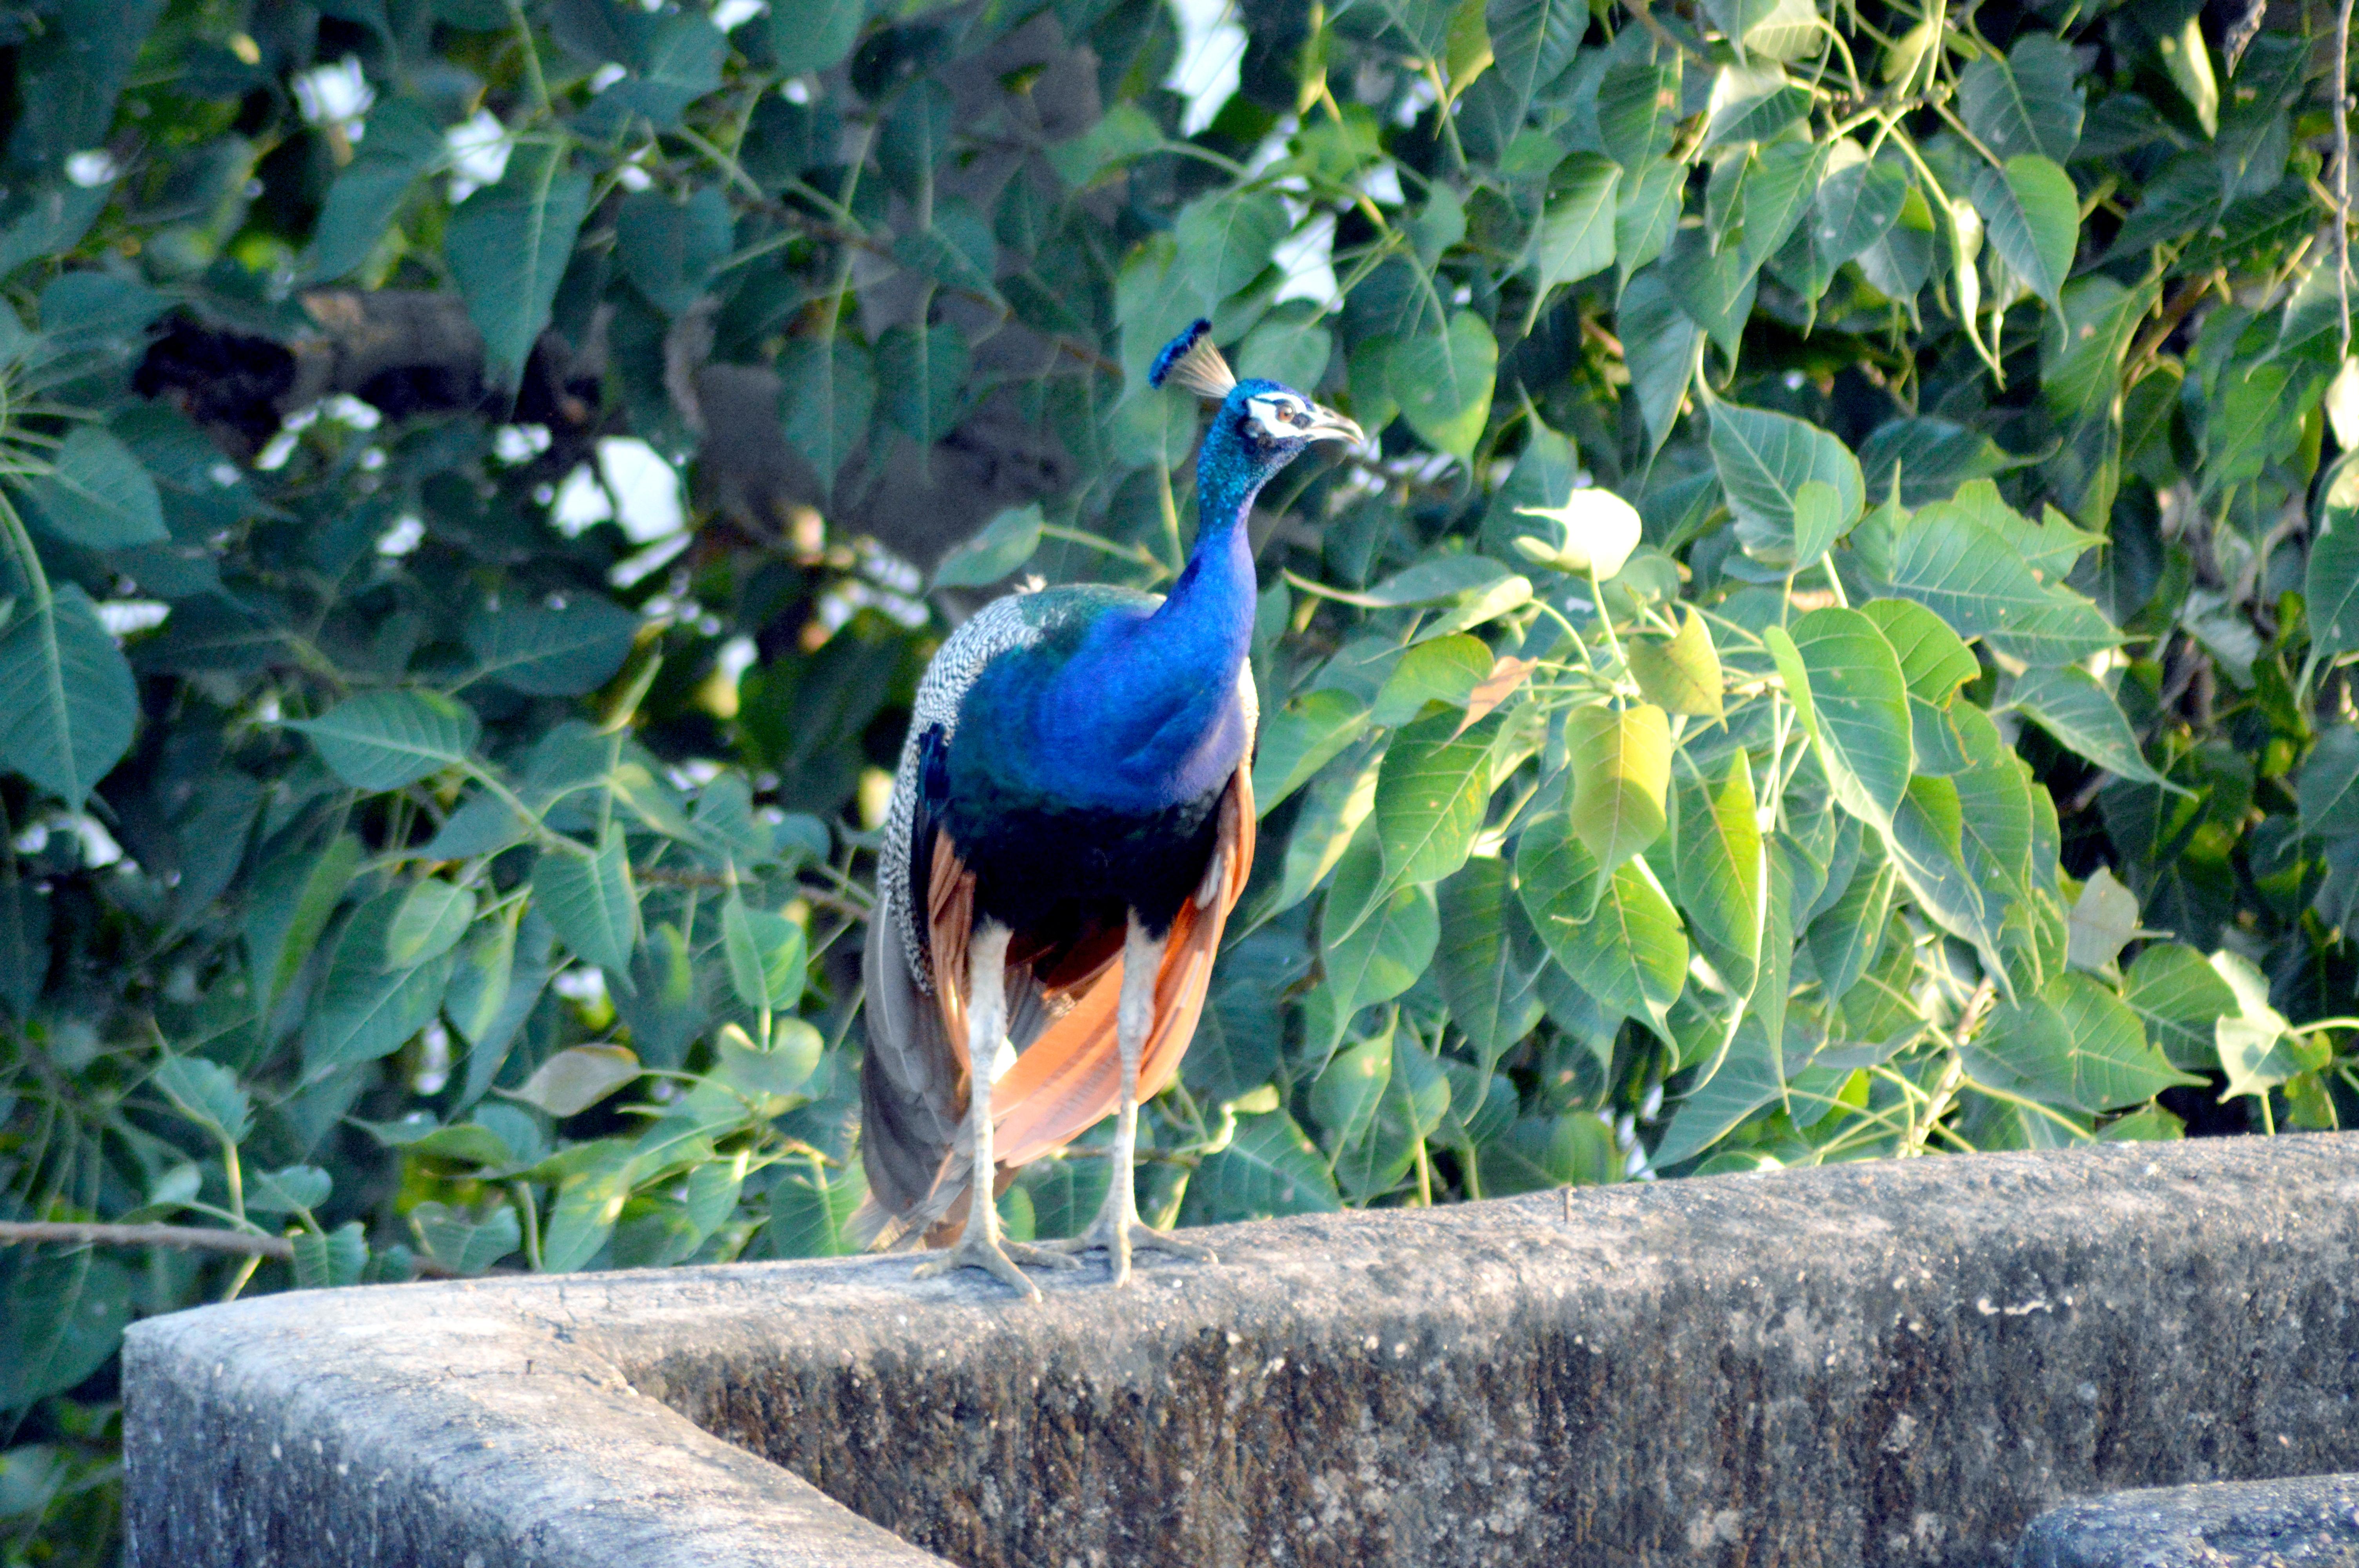 Blue peacock standing near tree